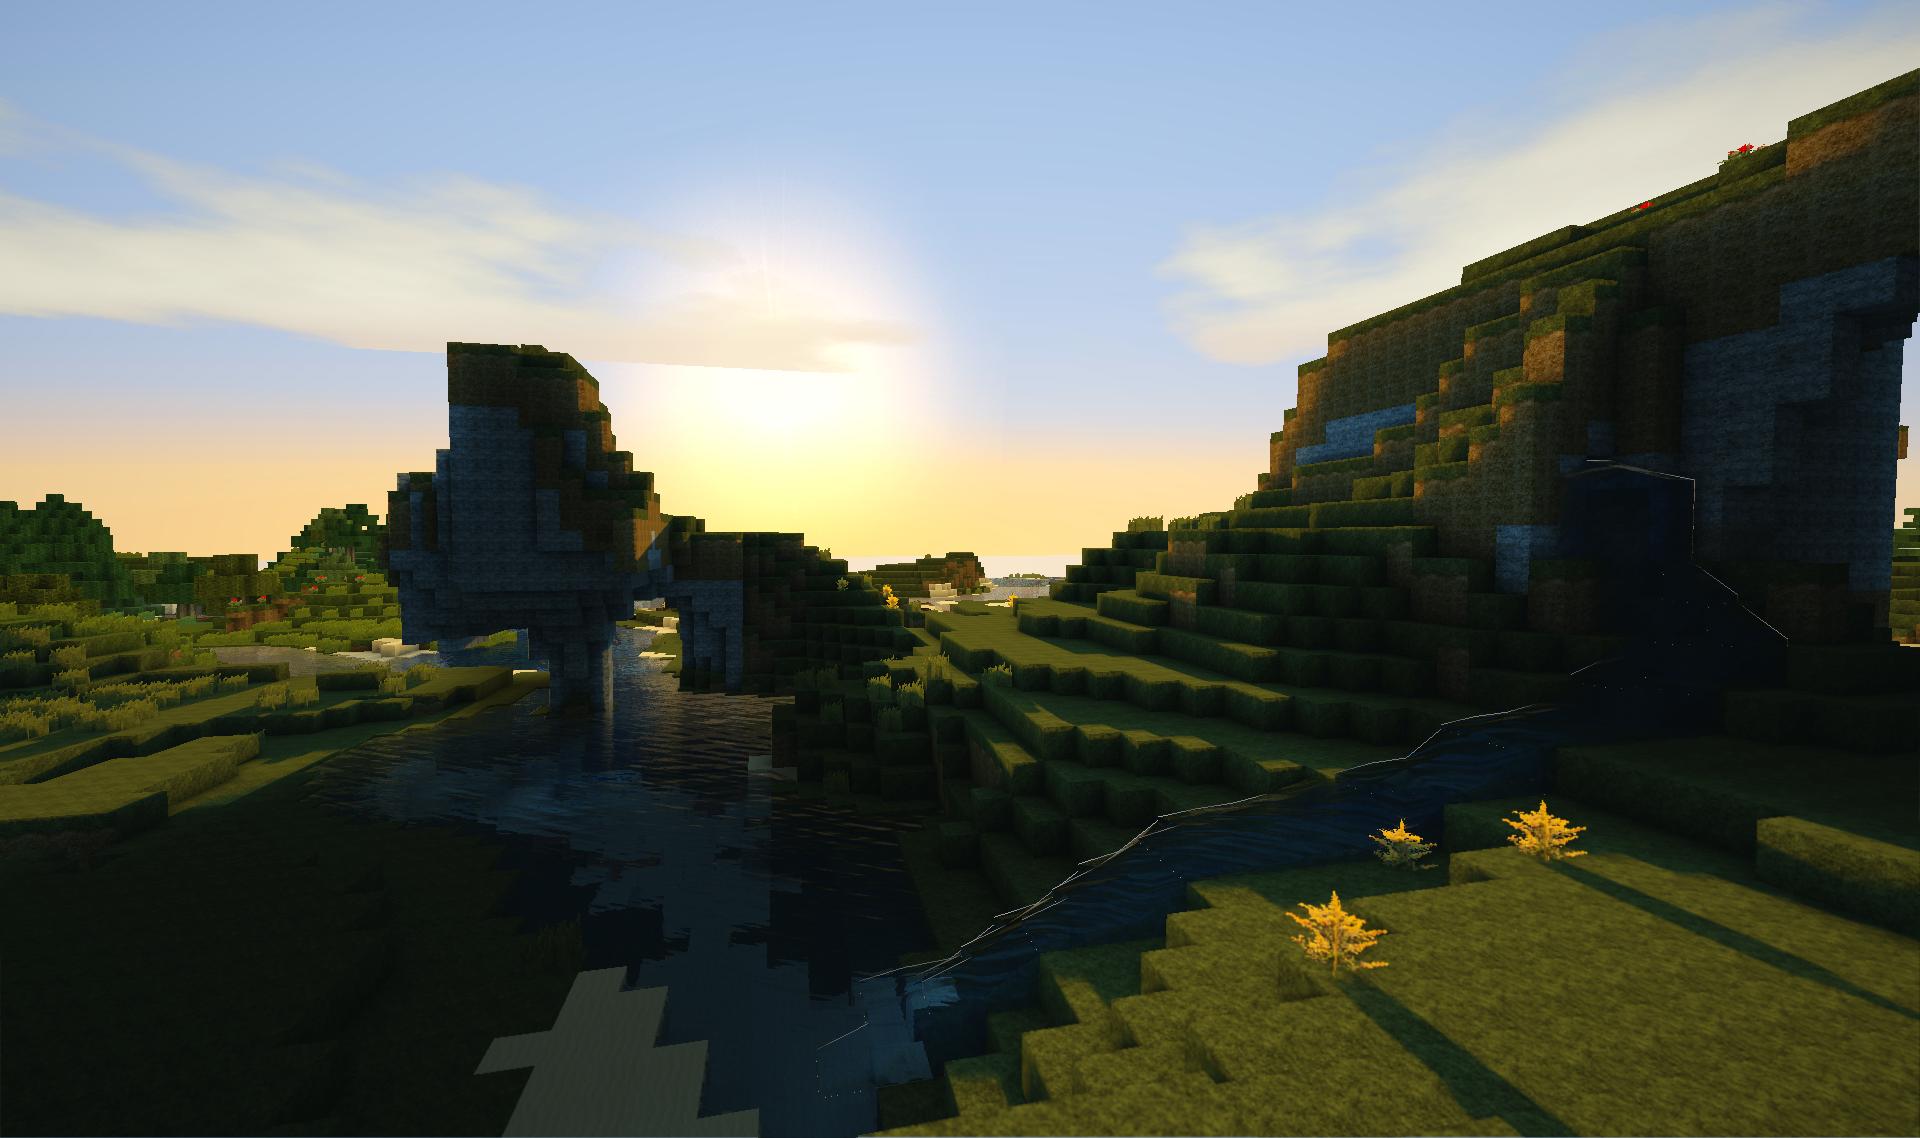 Plano De Fundo Minecraft